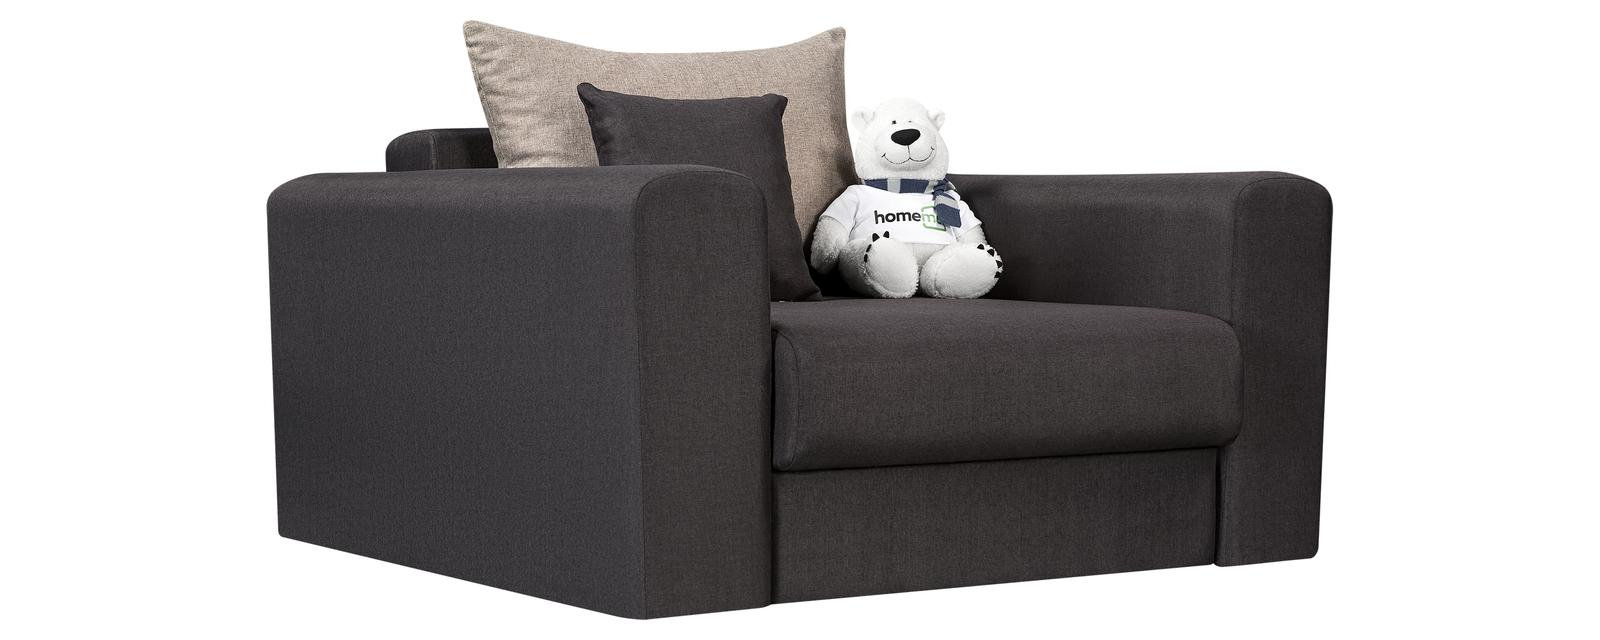 Кресло тканевое Медисон 80 см Kiton тёмно-серый (Рогожка) Медисон